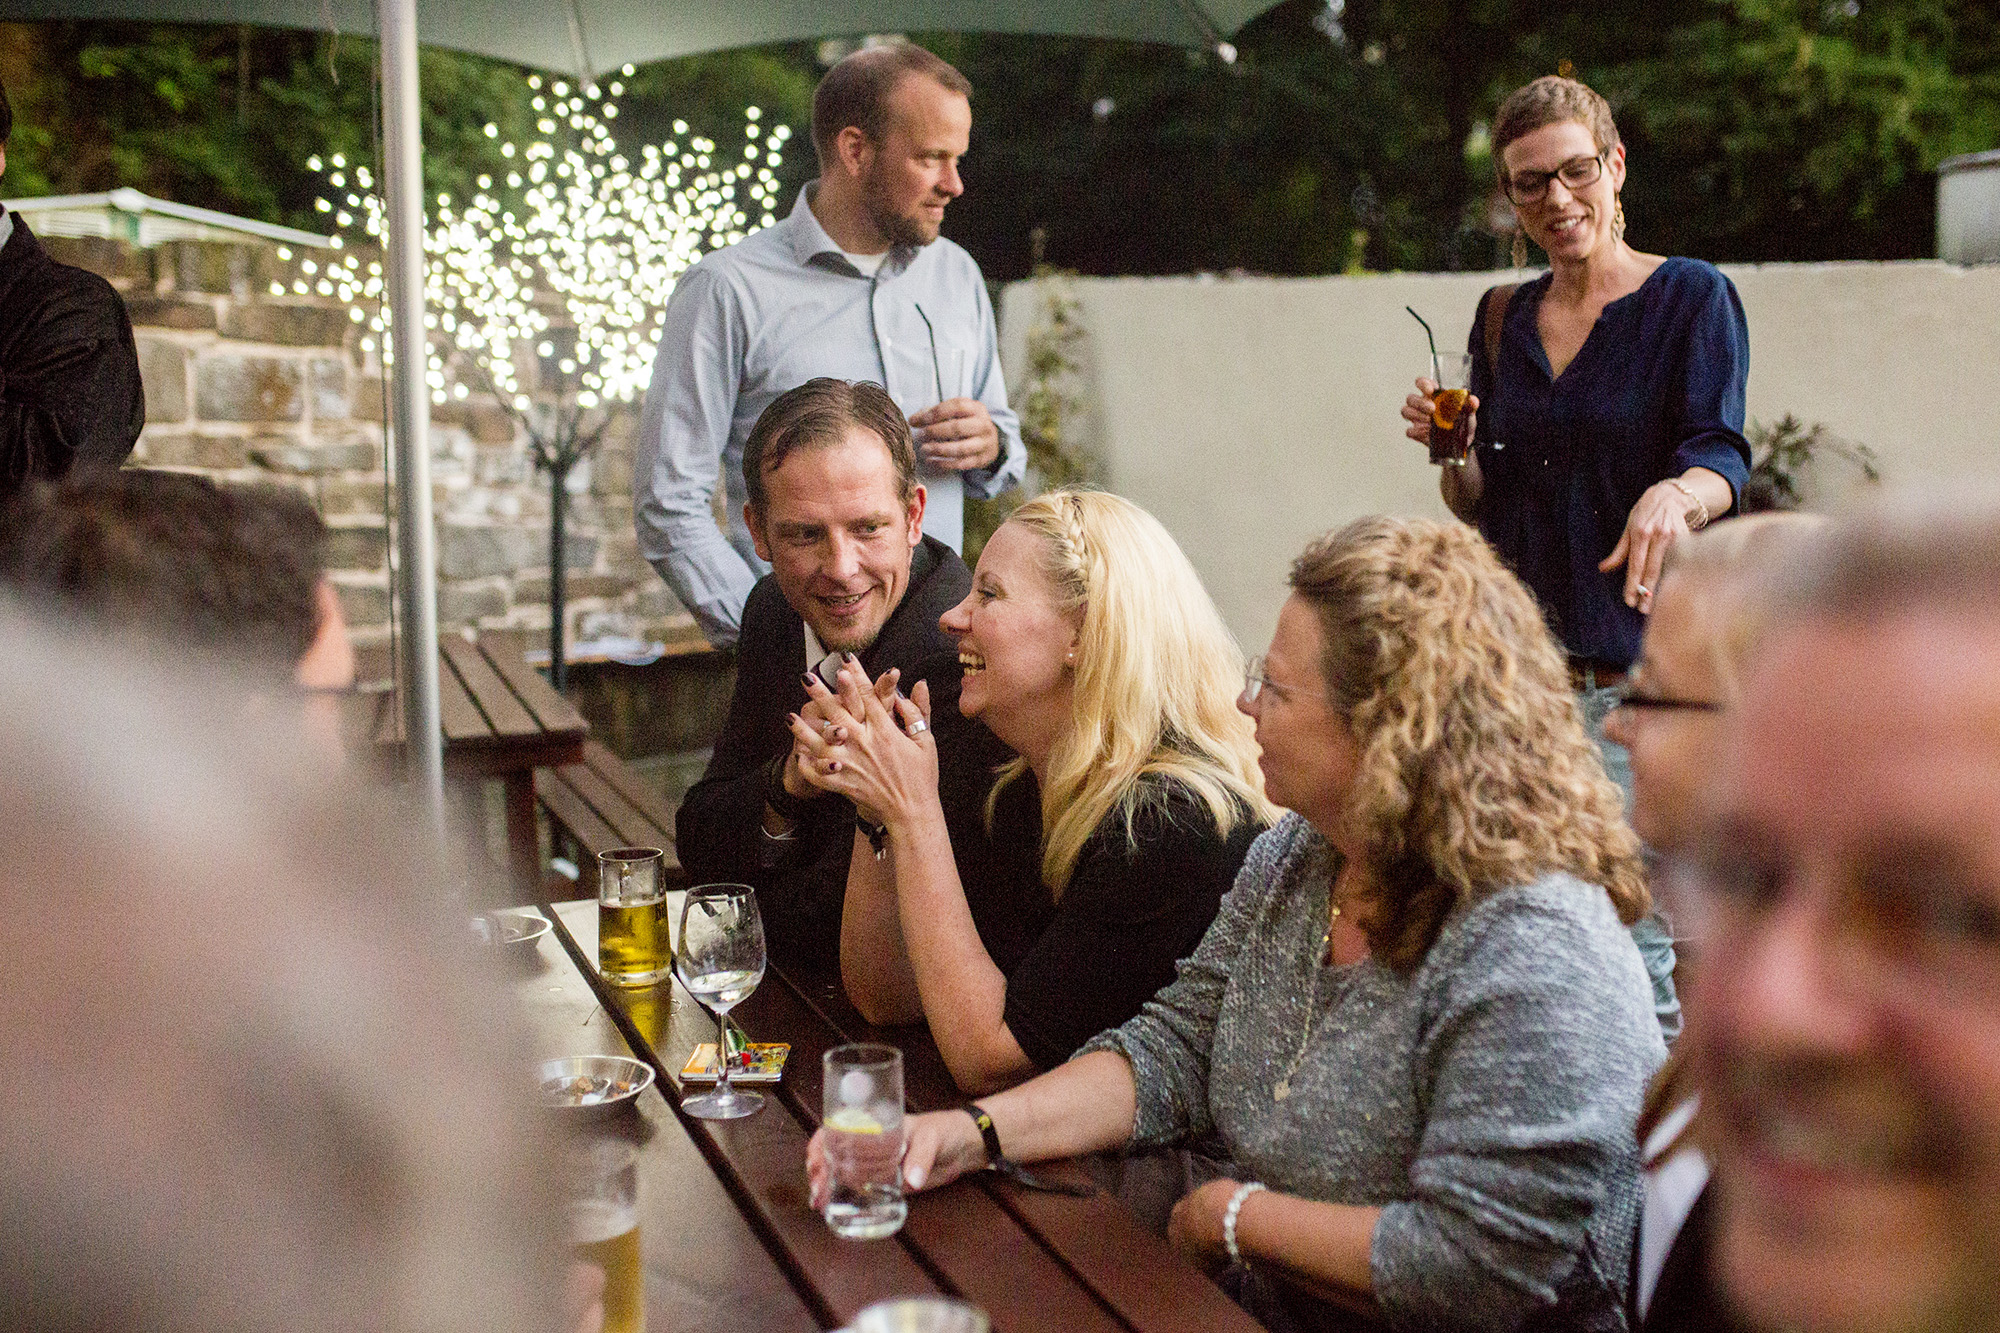 Seriously_Sabrina_Photography_Essen_Germany_RocknRoll_Hochzeit_Wedding_PatrickJenny127.jpg